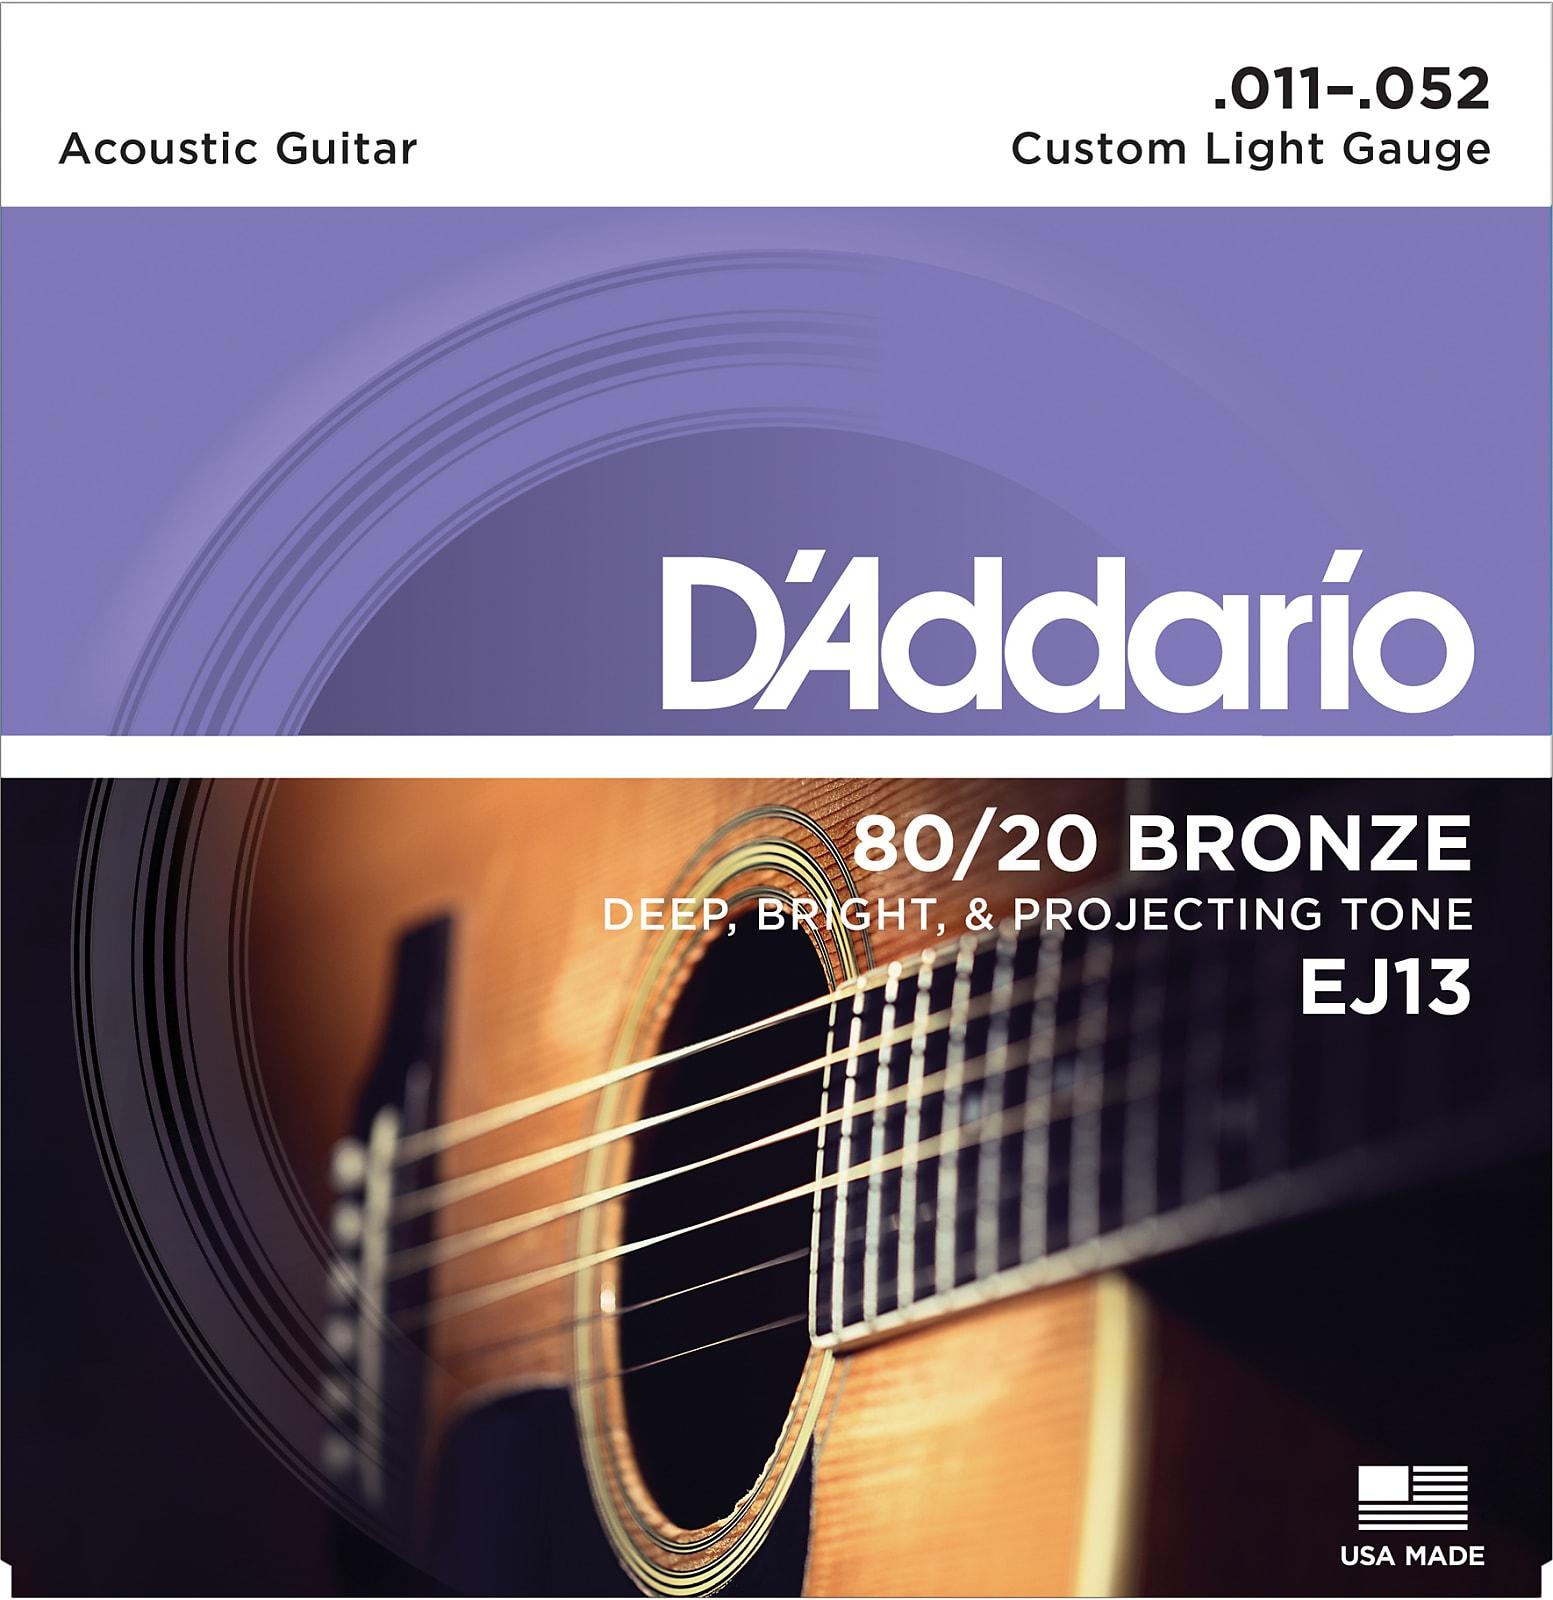 D'Addario EJ13 80/20 Bronze Acoustic Guitar Strings, Custom Light, 11-52